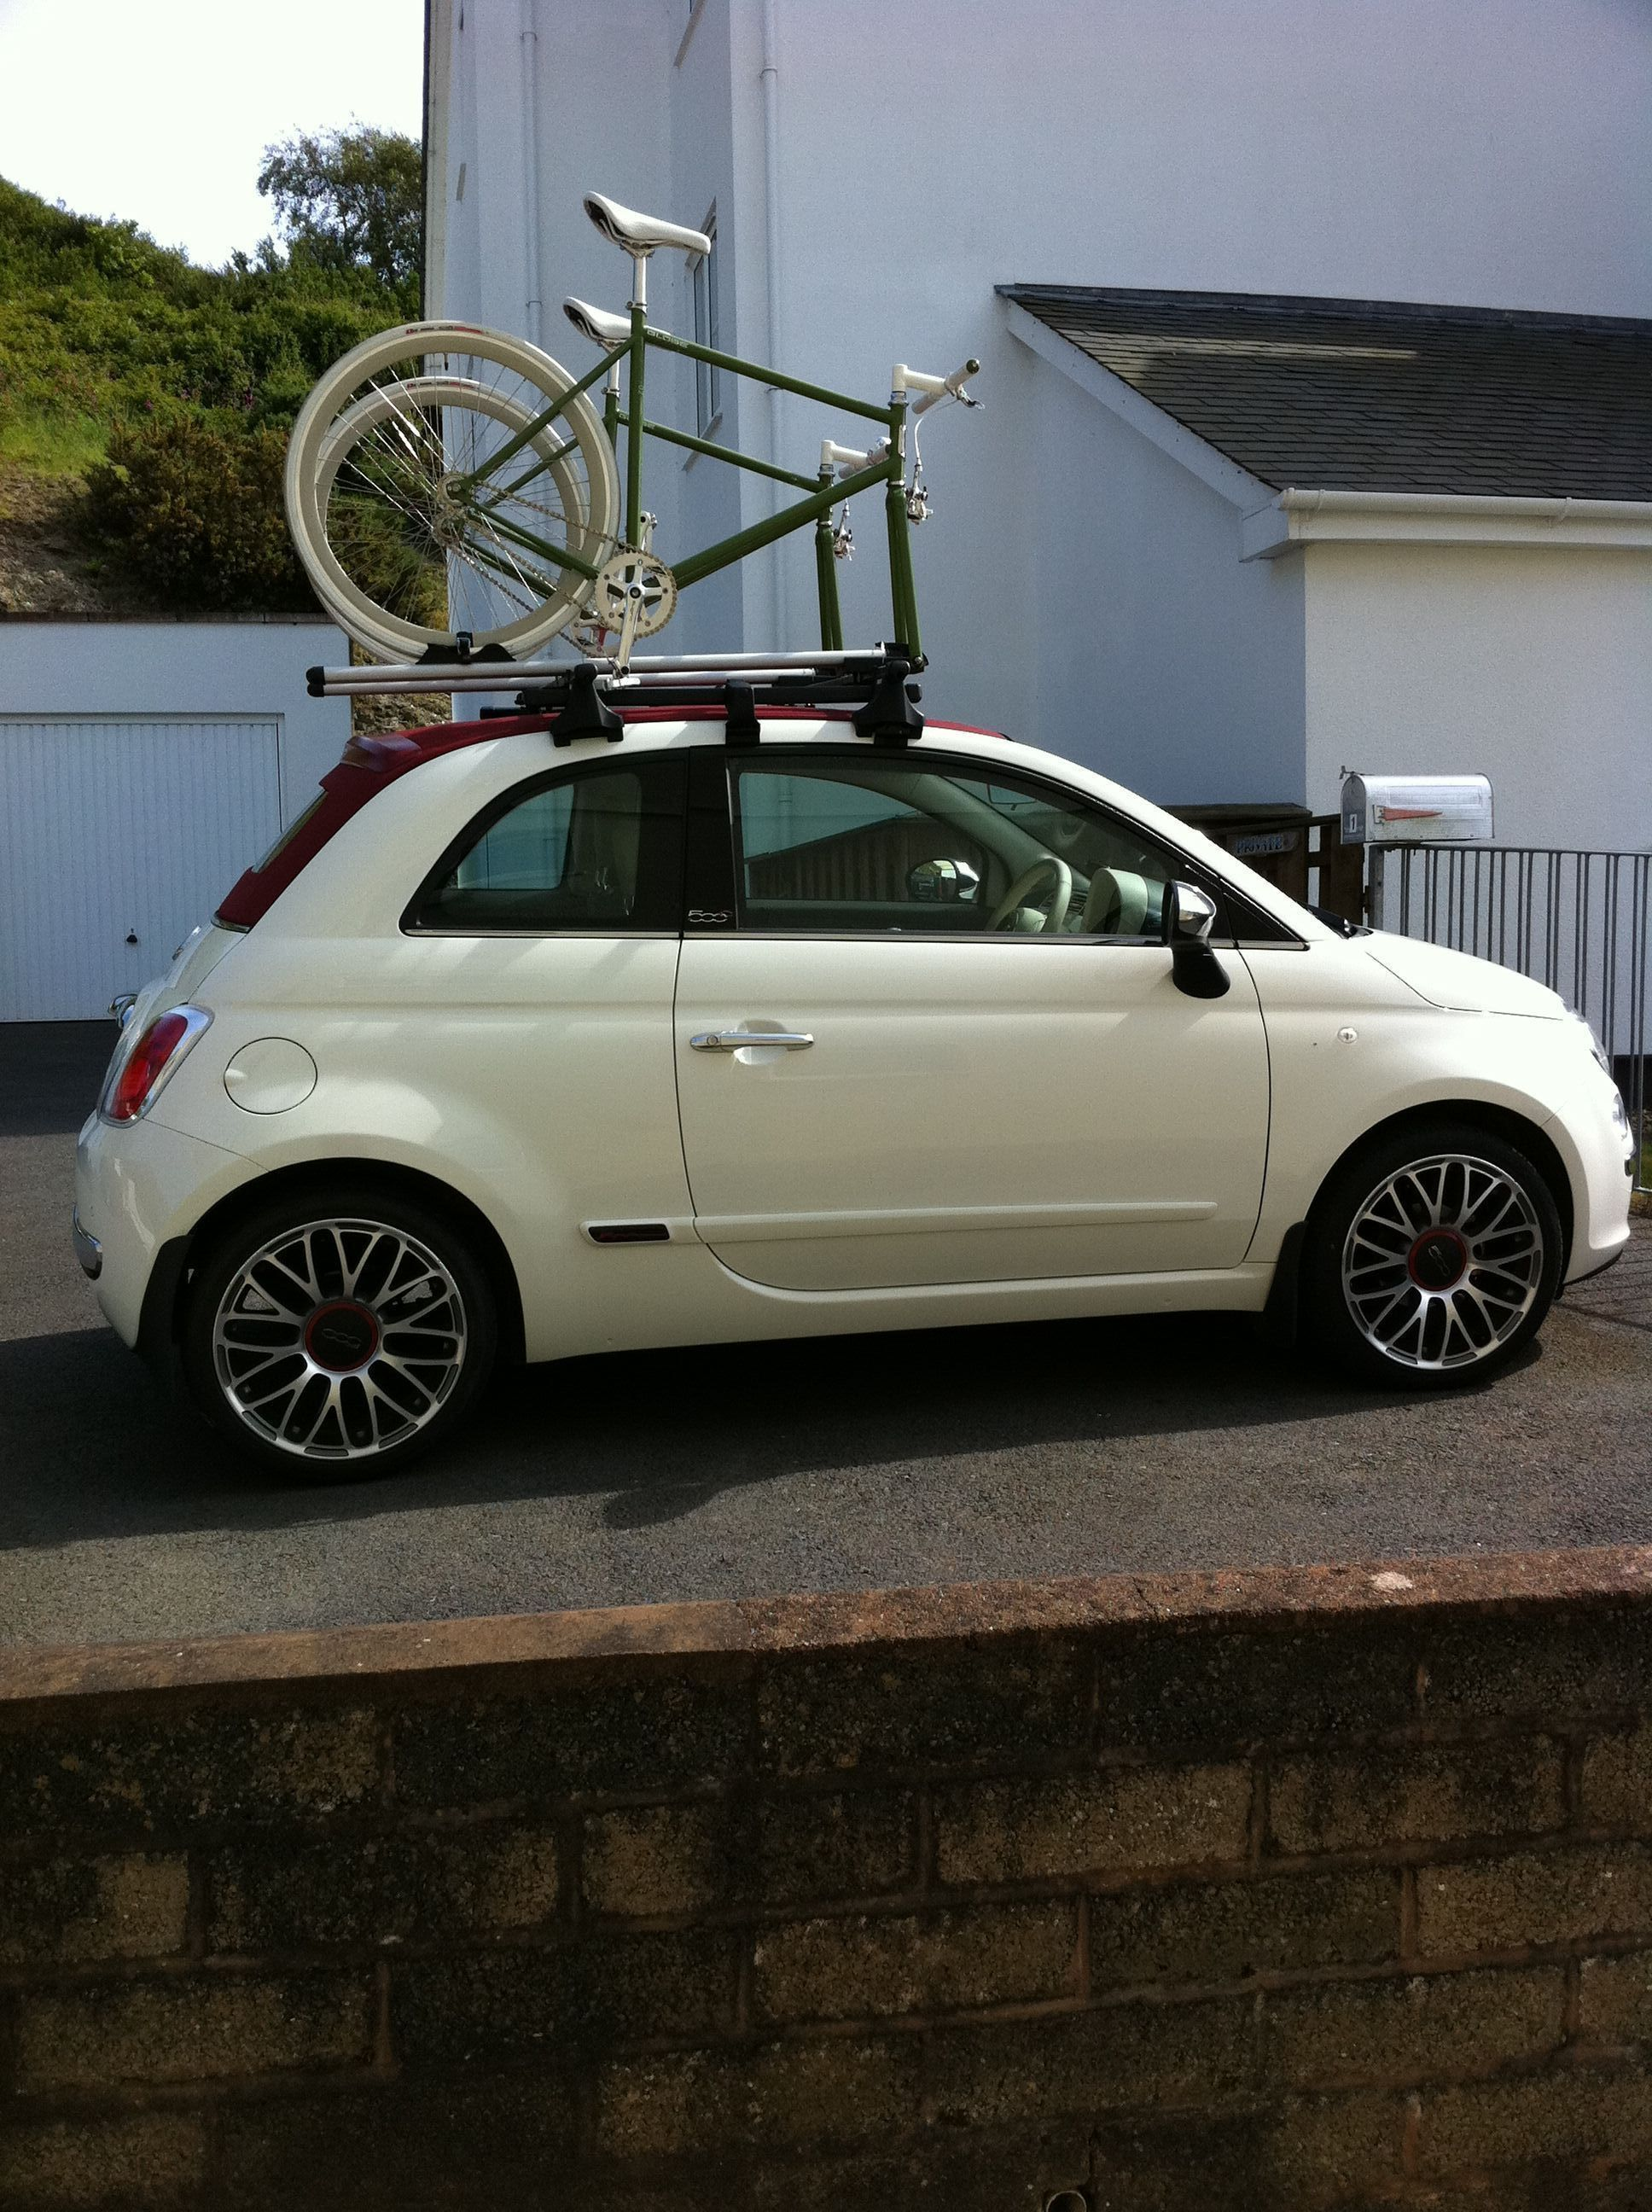 Fiat 500c Lounge 17 Inch Abarth Alloys Full Roof Rack